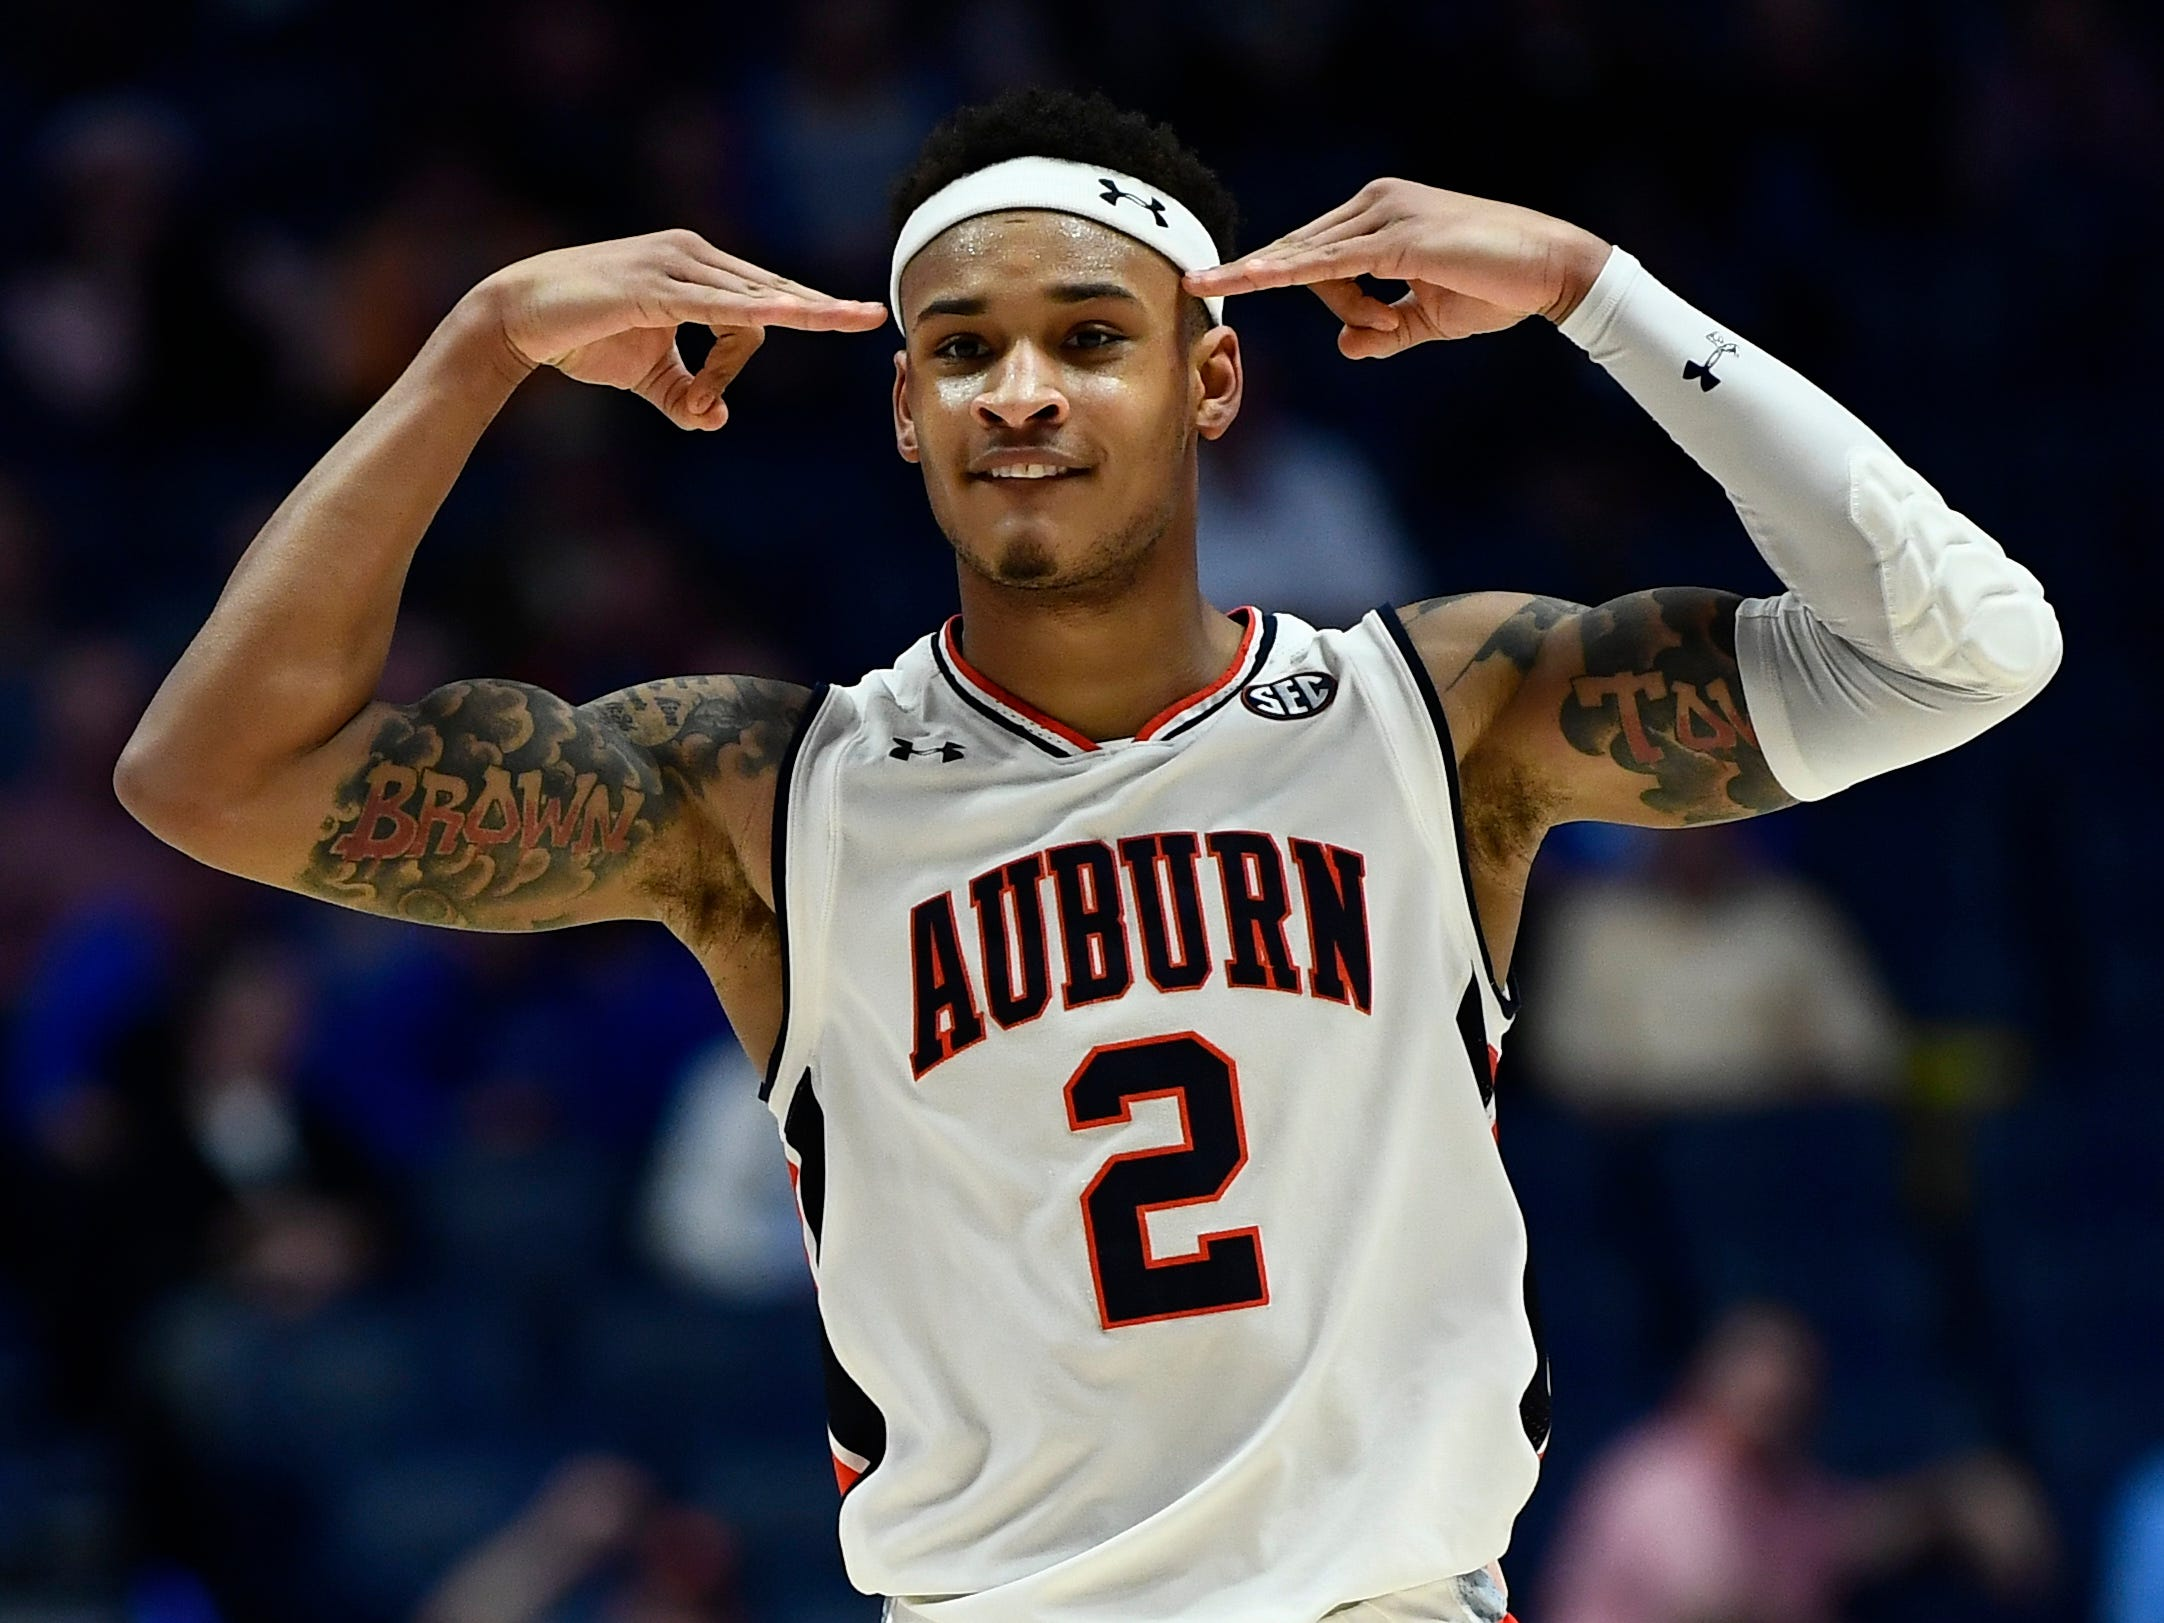 Auburn guard Bryce Brown (2) celebrates his three-pointer during the second half of the SEC Men's Basketball Tournament game at Bridgestone Arena in Nashville, Tenn., Thursday, March 14, 2019.